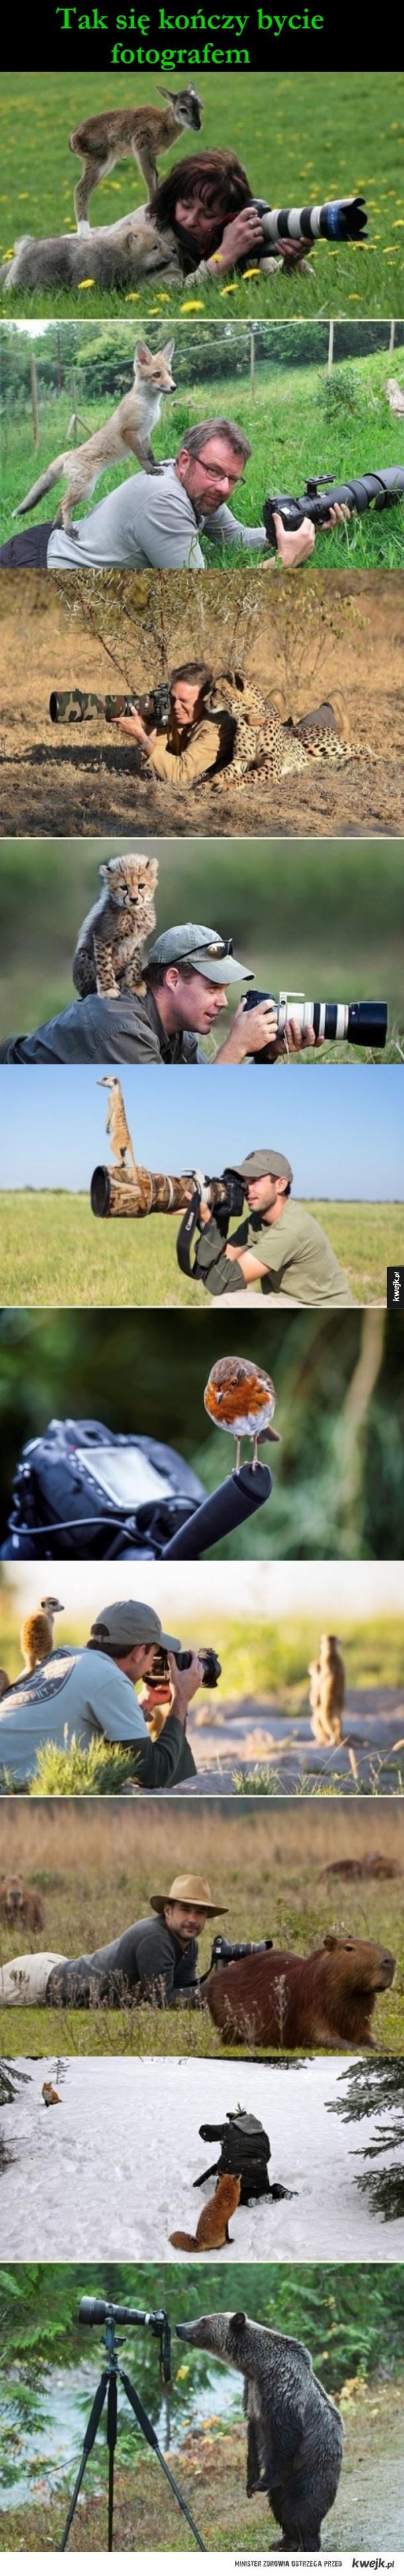 Żywot fotografa